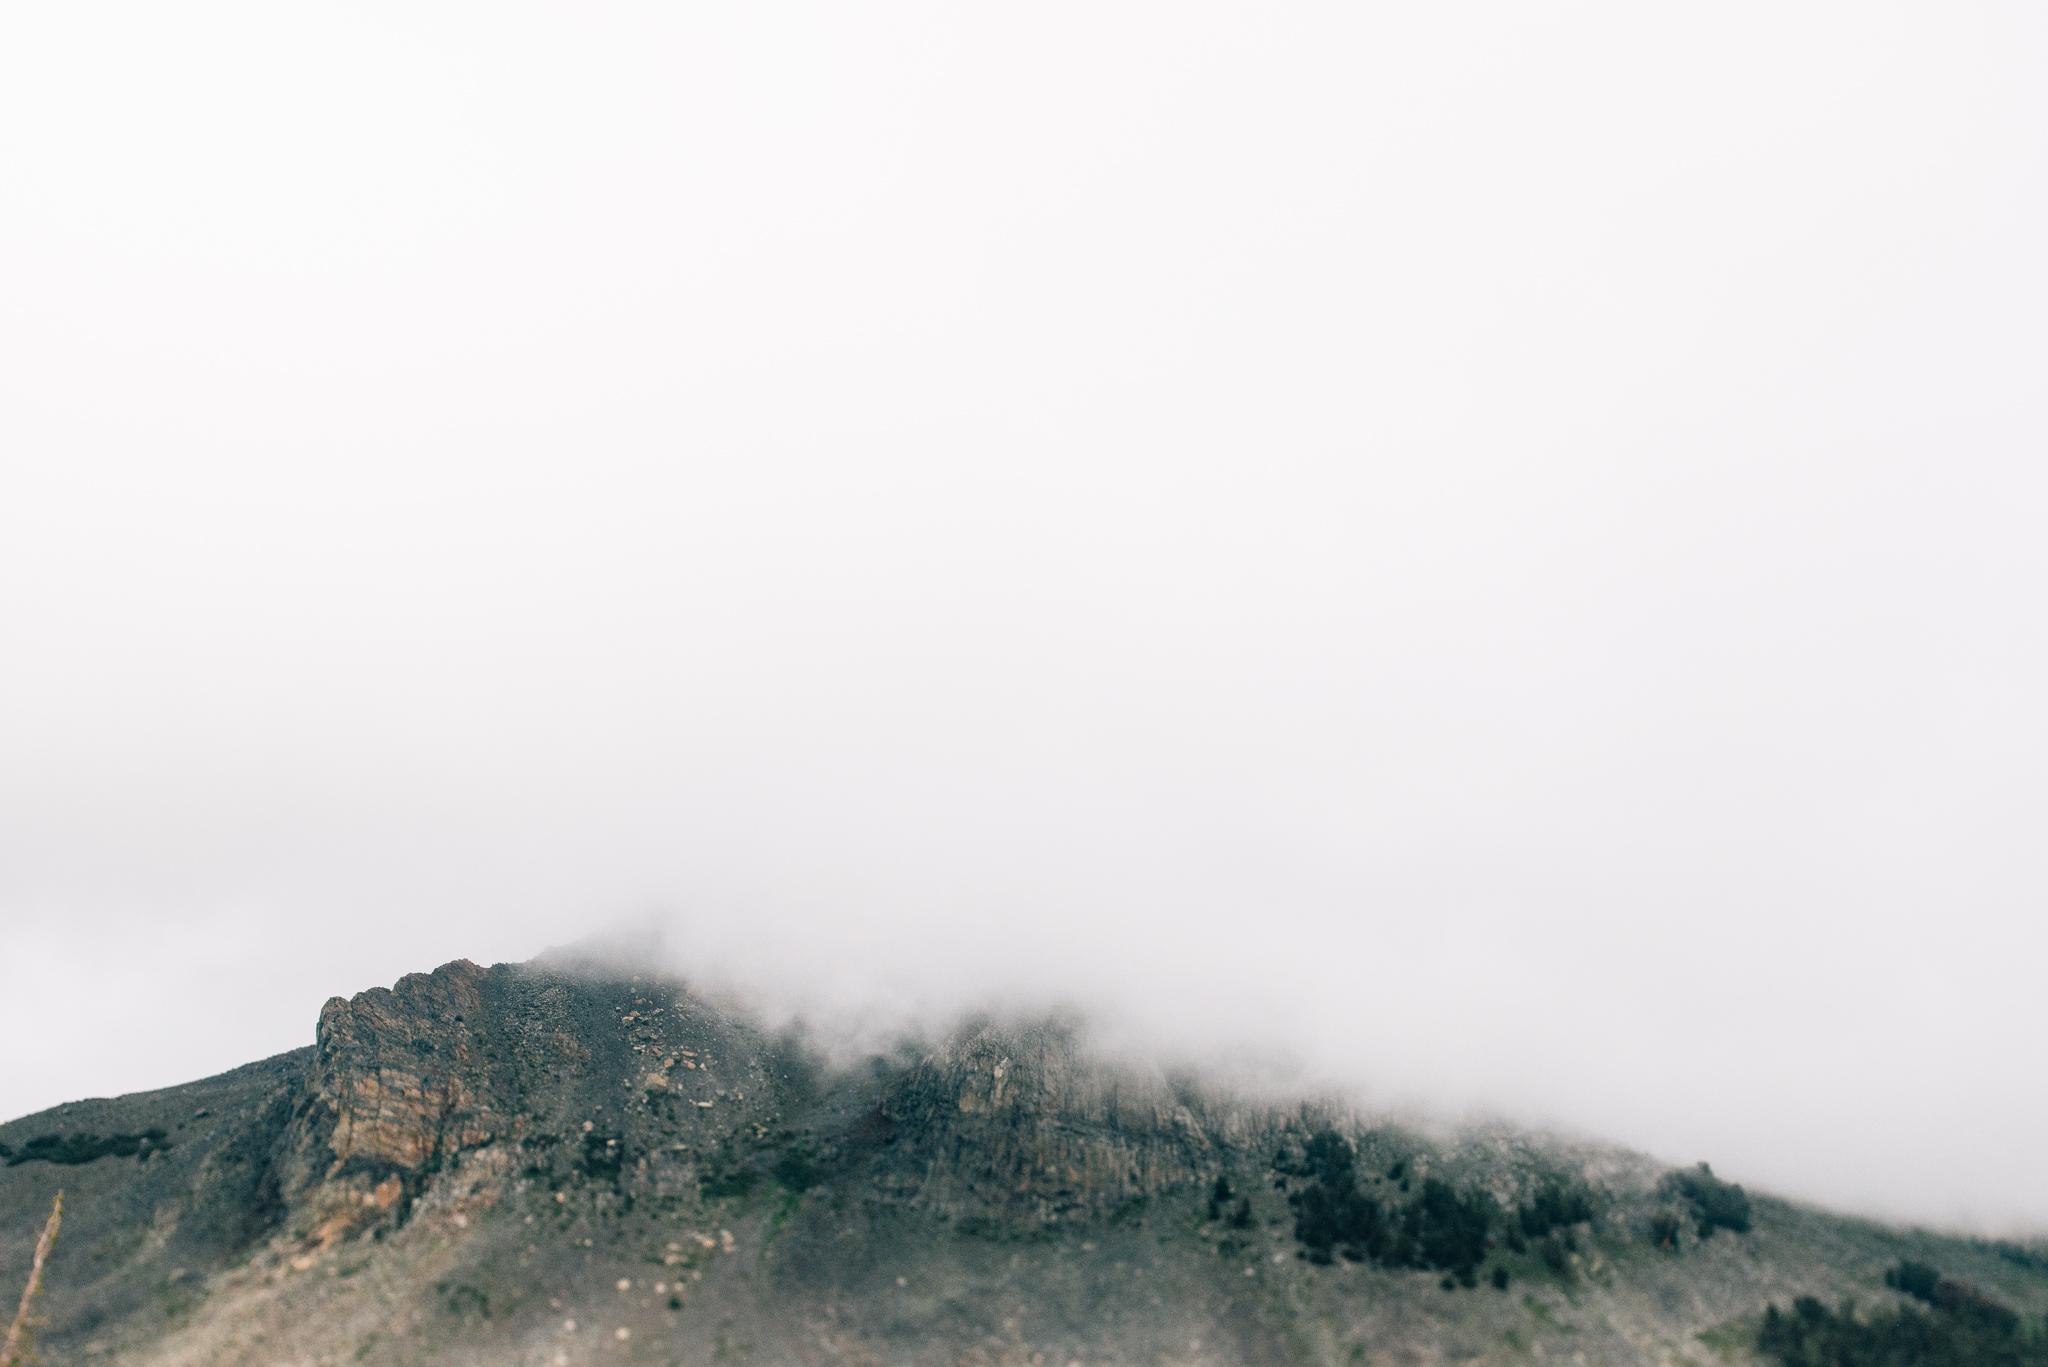 ©The Ryans Photography - Los Angeles Travel - Tuolomne Meadows Yosemite-011.jpg